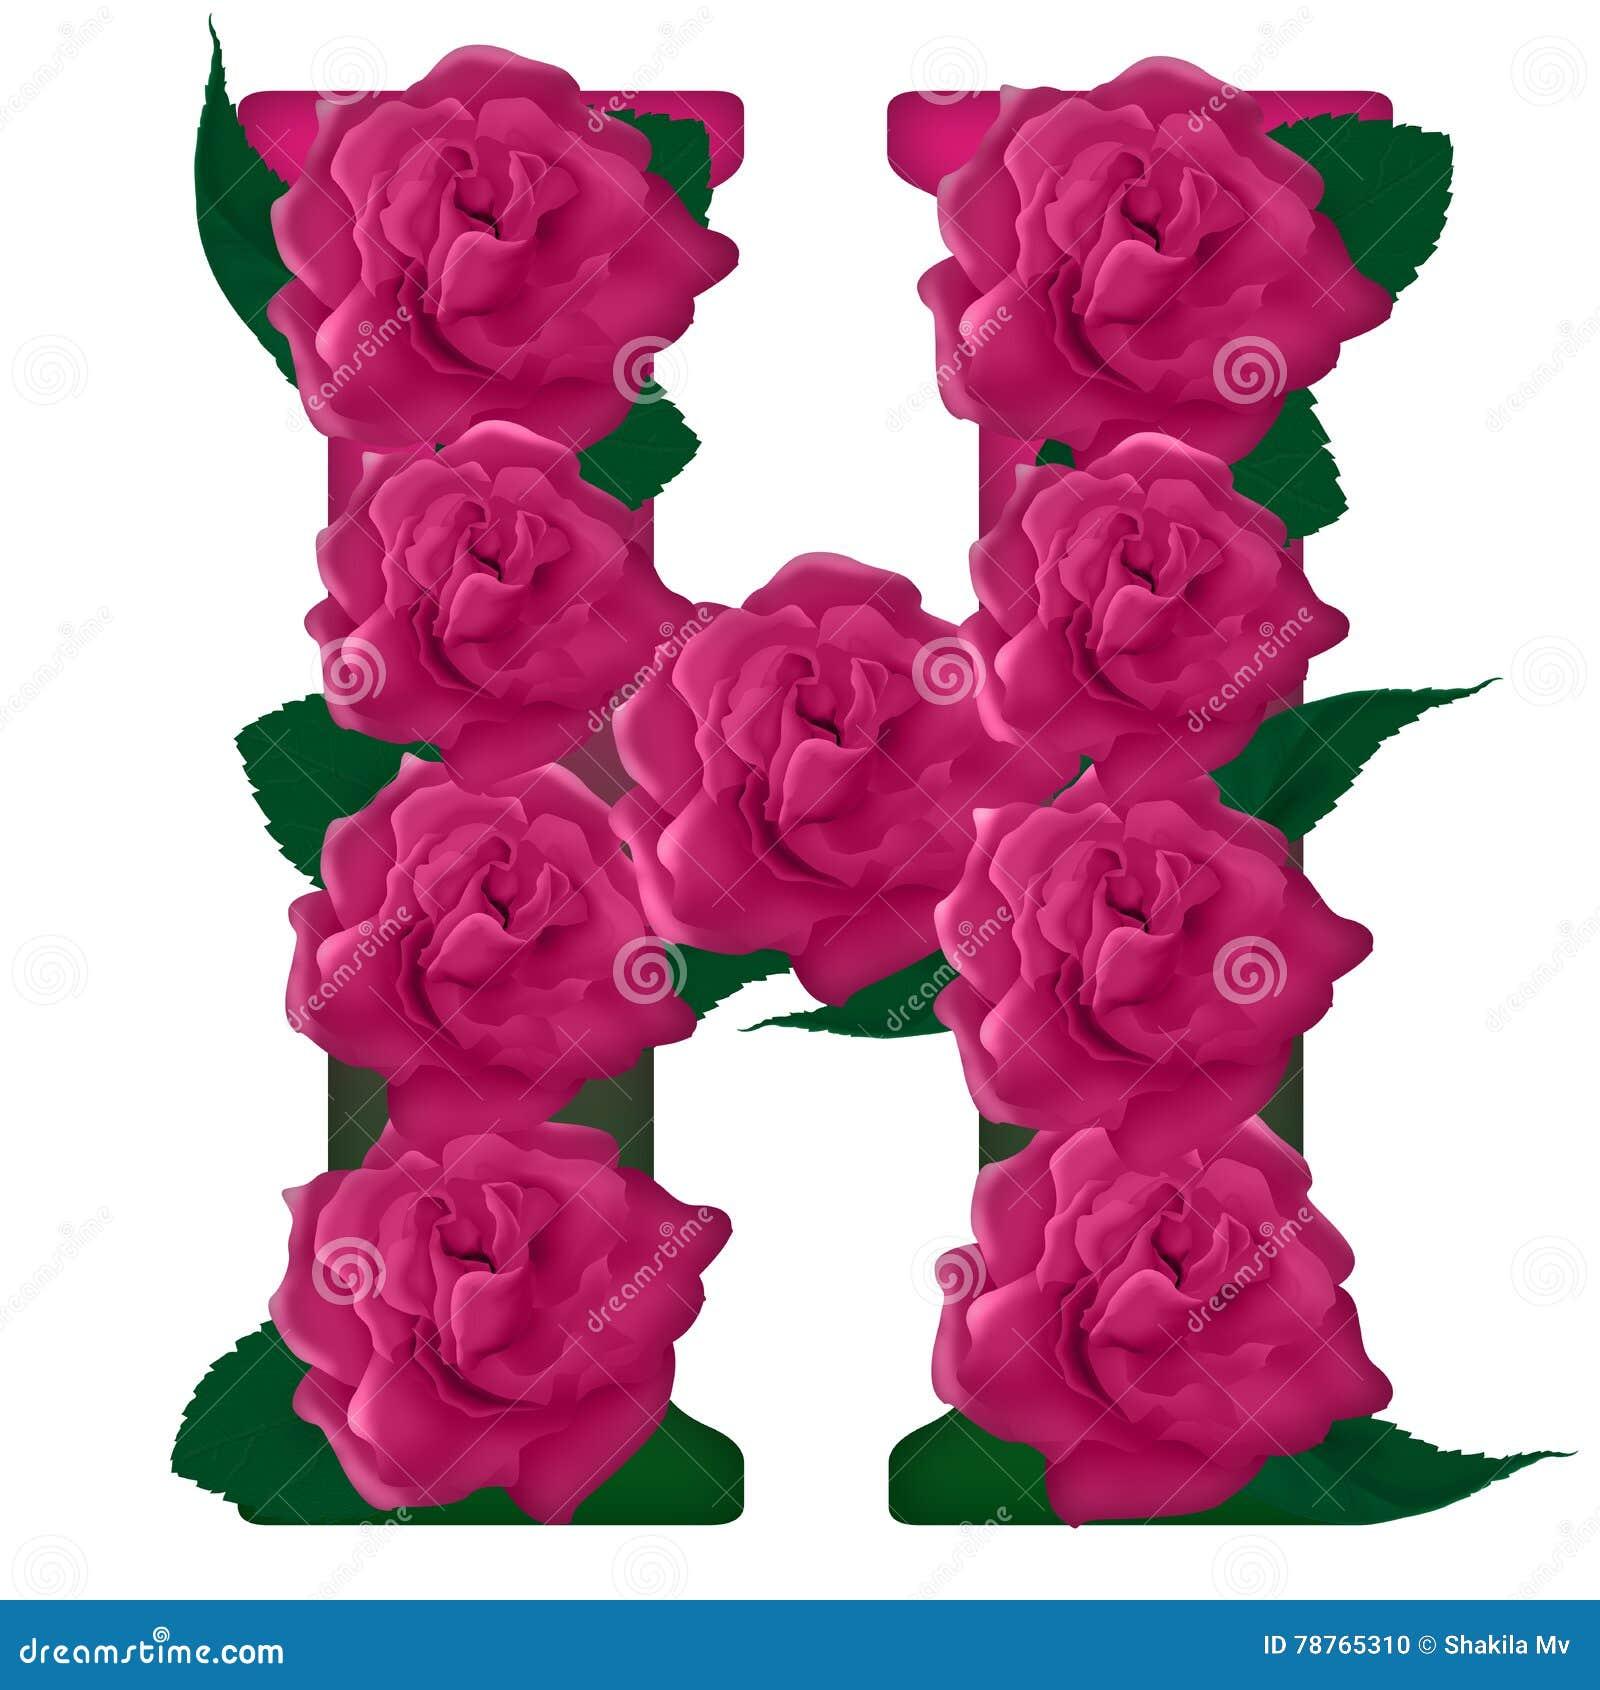 Letter H Cute Flower Illustration Illustration 78765310 - Megapixl